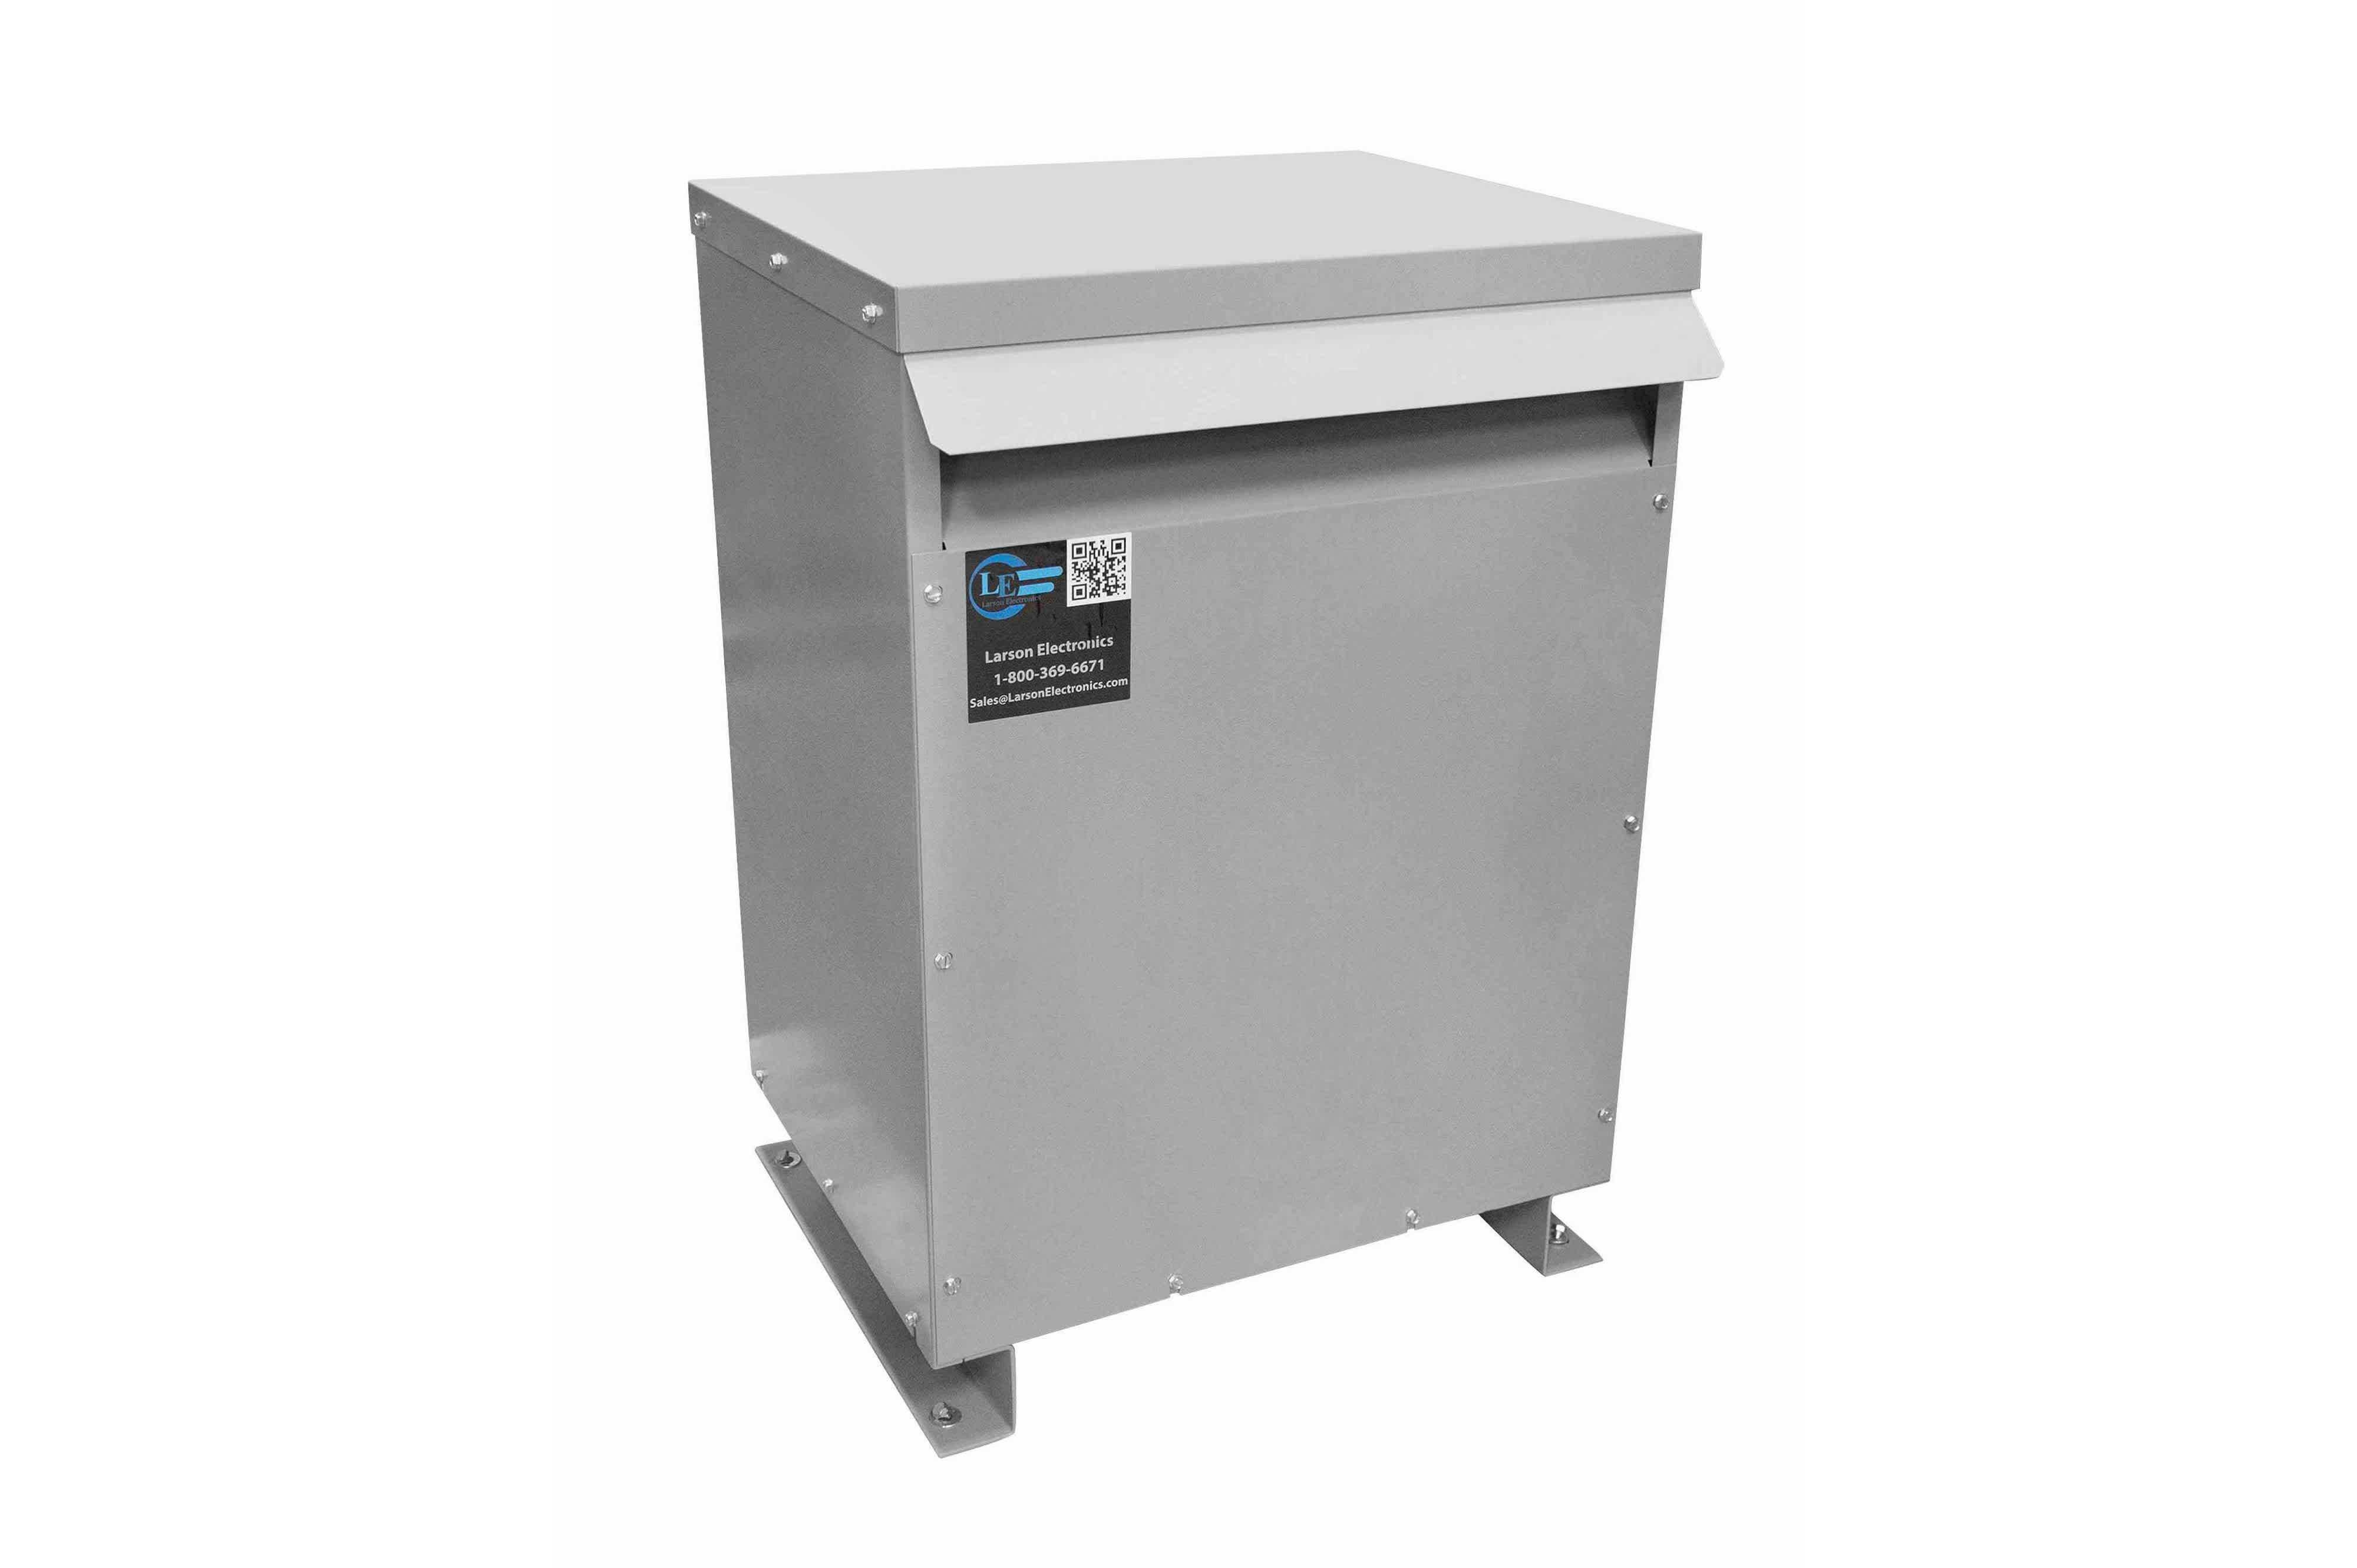 32.5 kVA 3PH Isolation Transformer, 460V Wye Primary, 575V Delta Secondary, N3R, Ventilated, 60 Hz